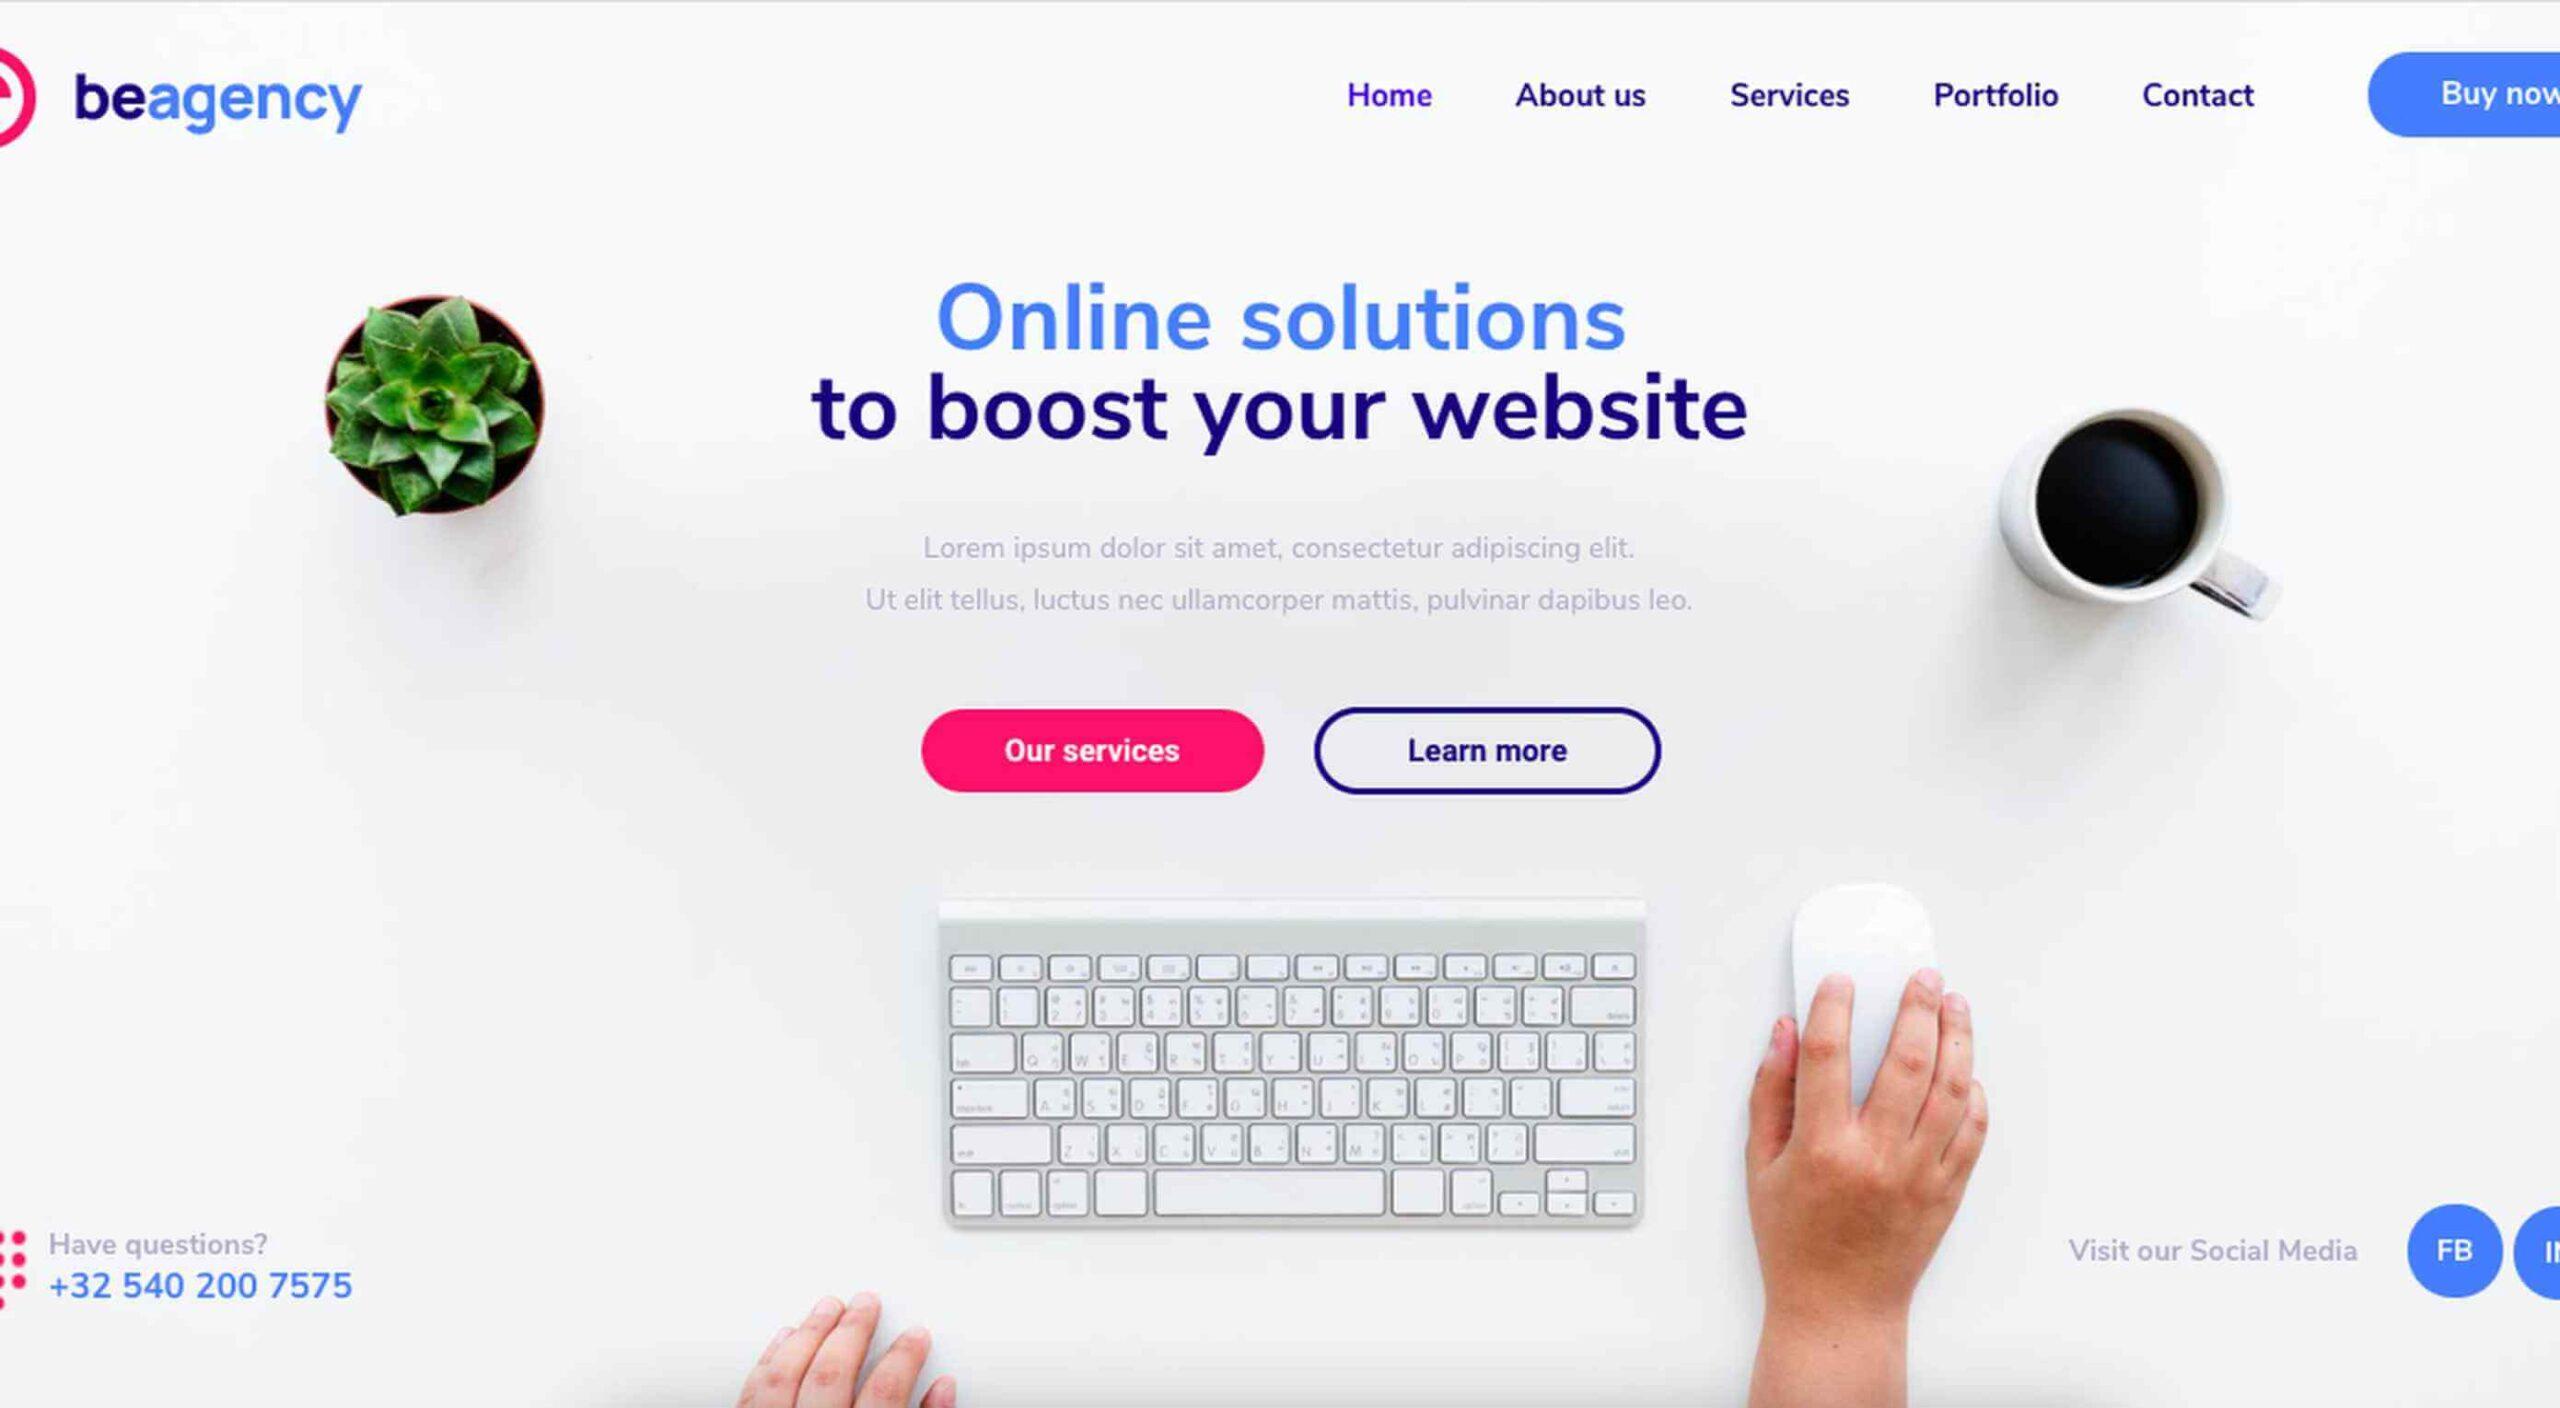 10+ Cool Pre-built Websites Designed With Creatives and Developersin Mind